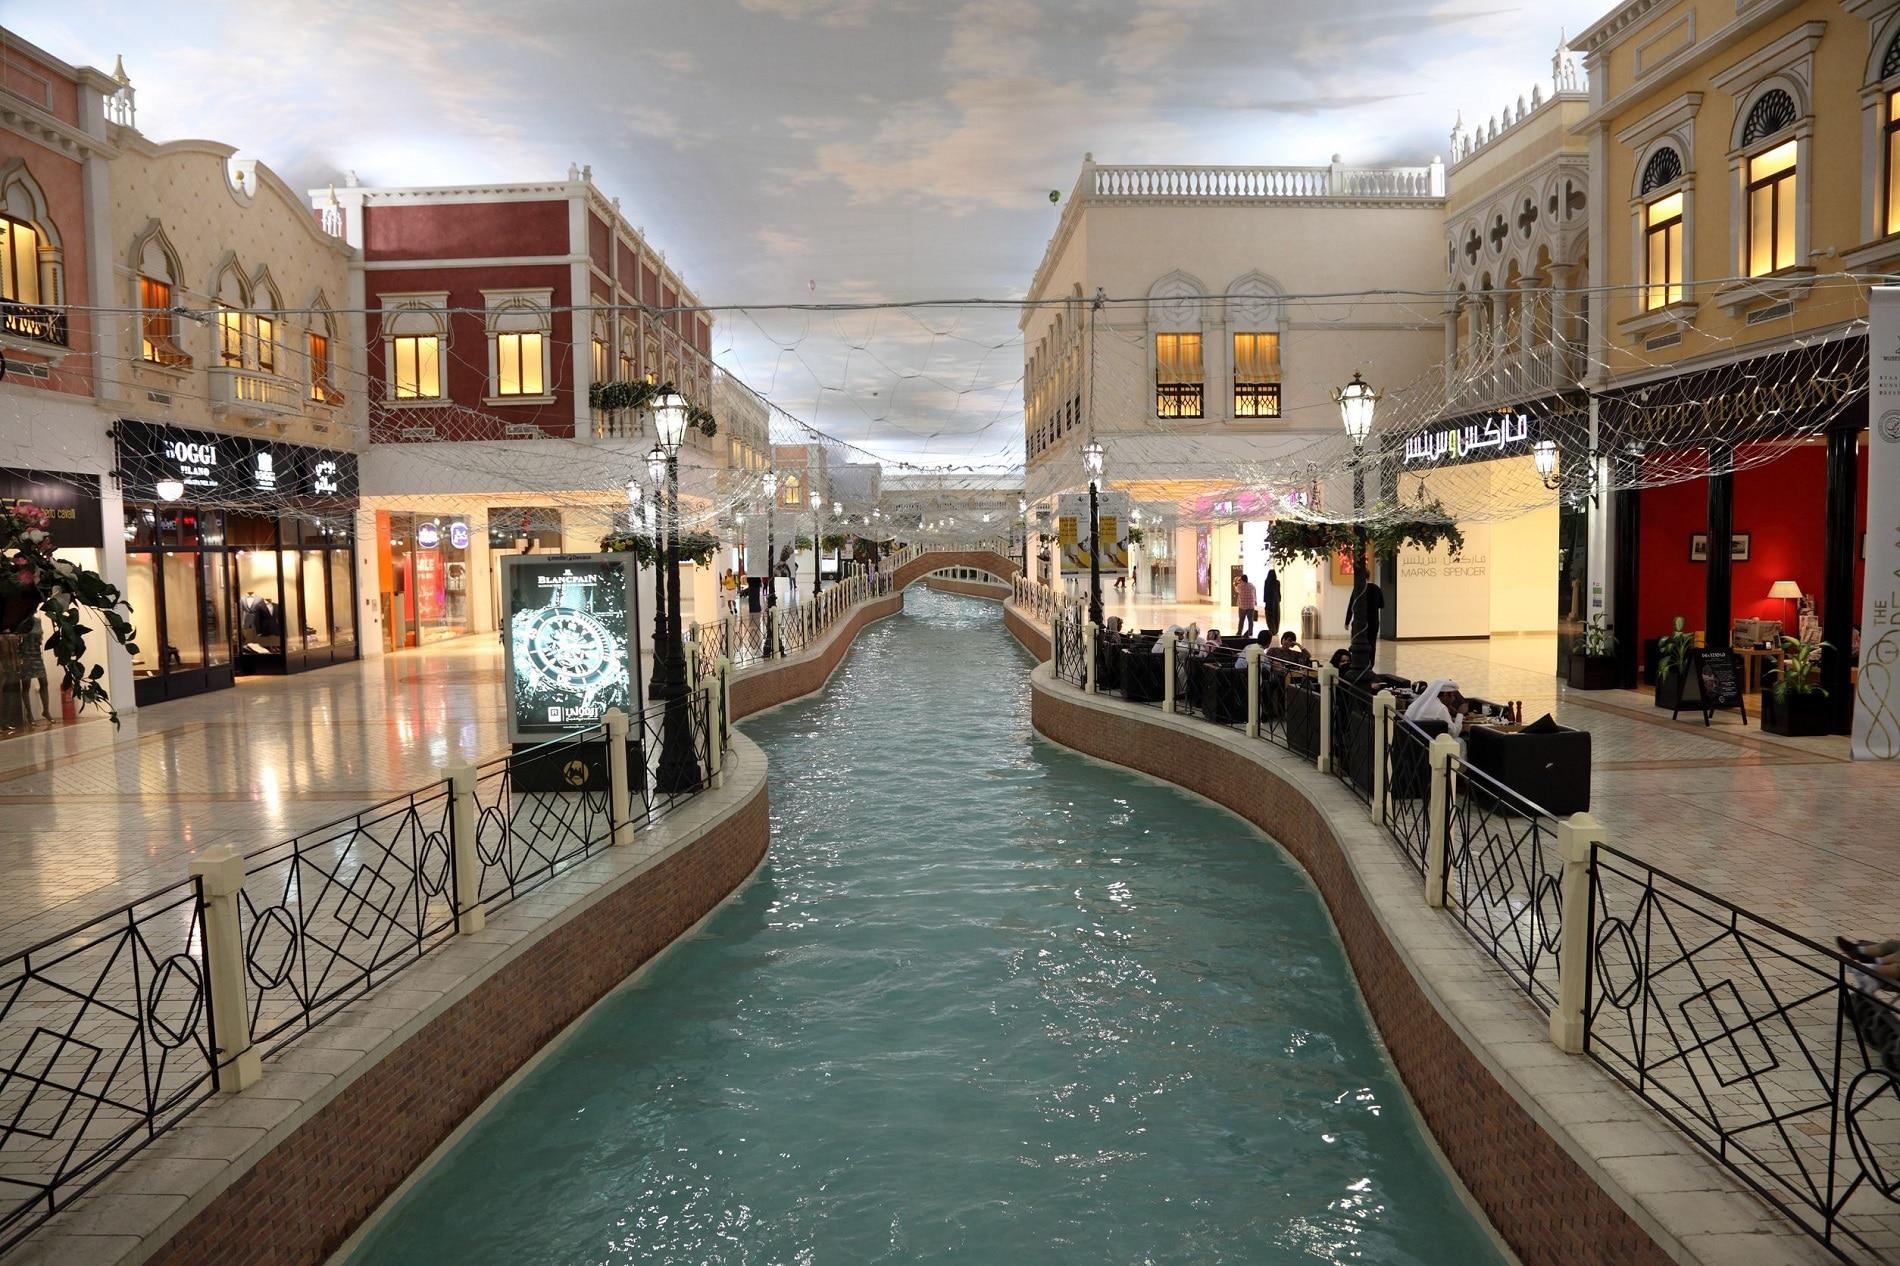 Așa arată Villaggio Mall din Doha